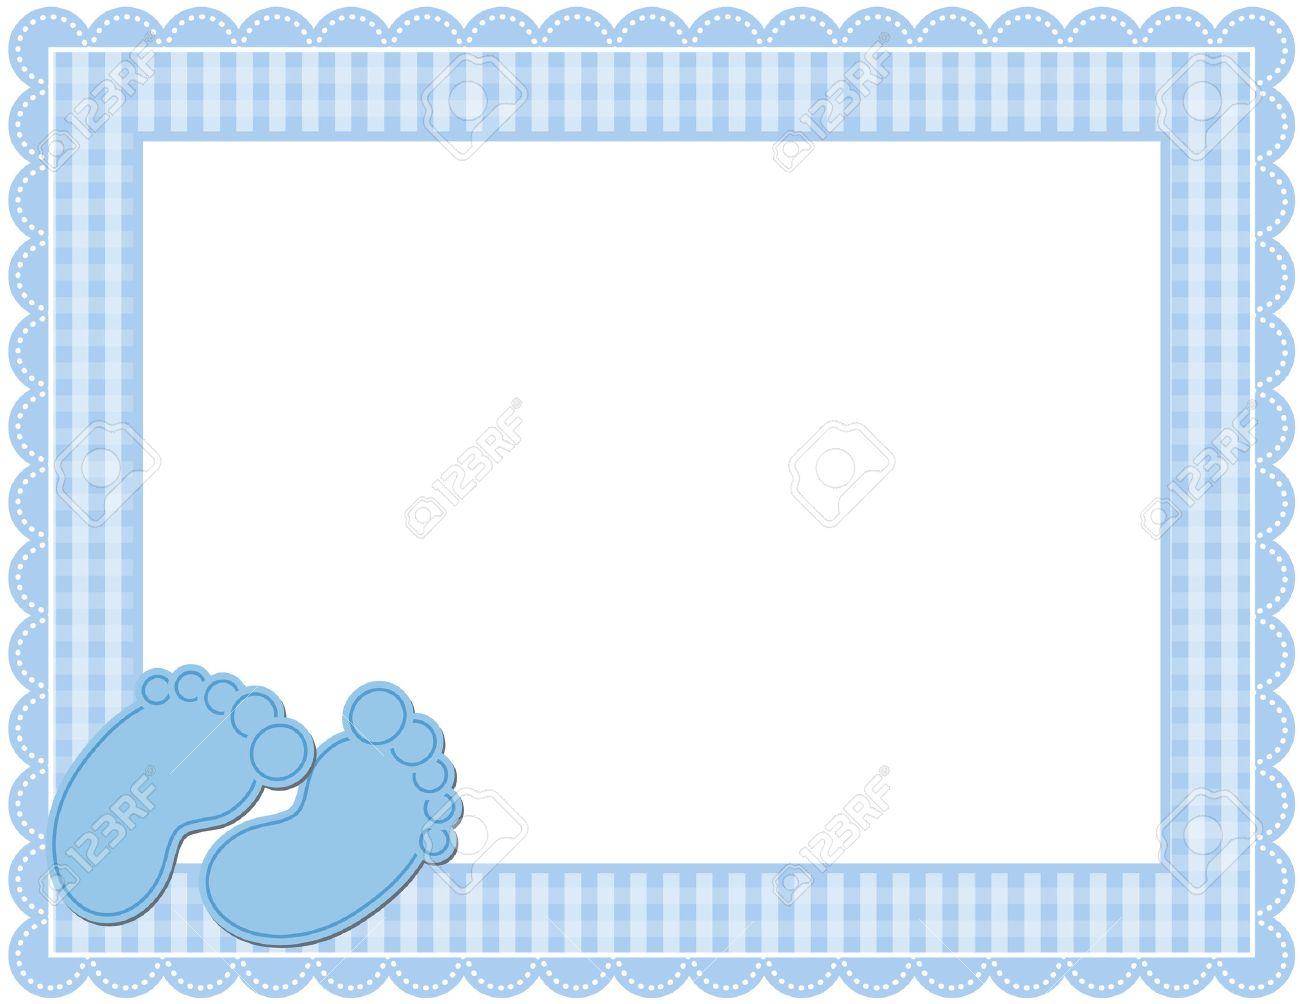 15593a6eef29 Baby Boy Gingham Frame Stock Vector - 34079406